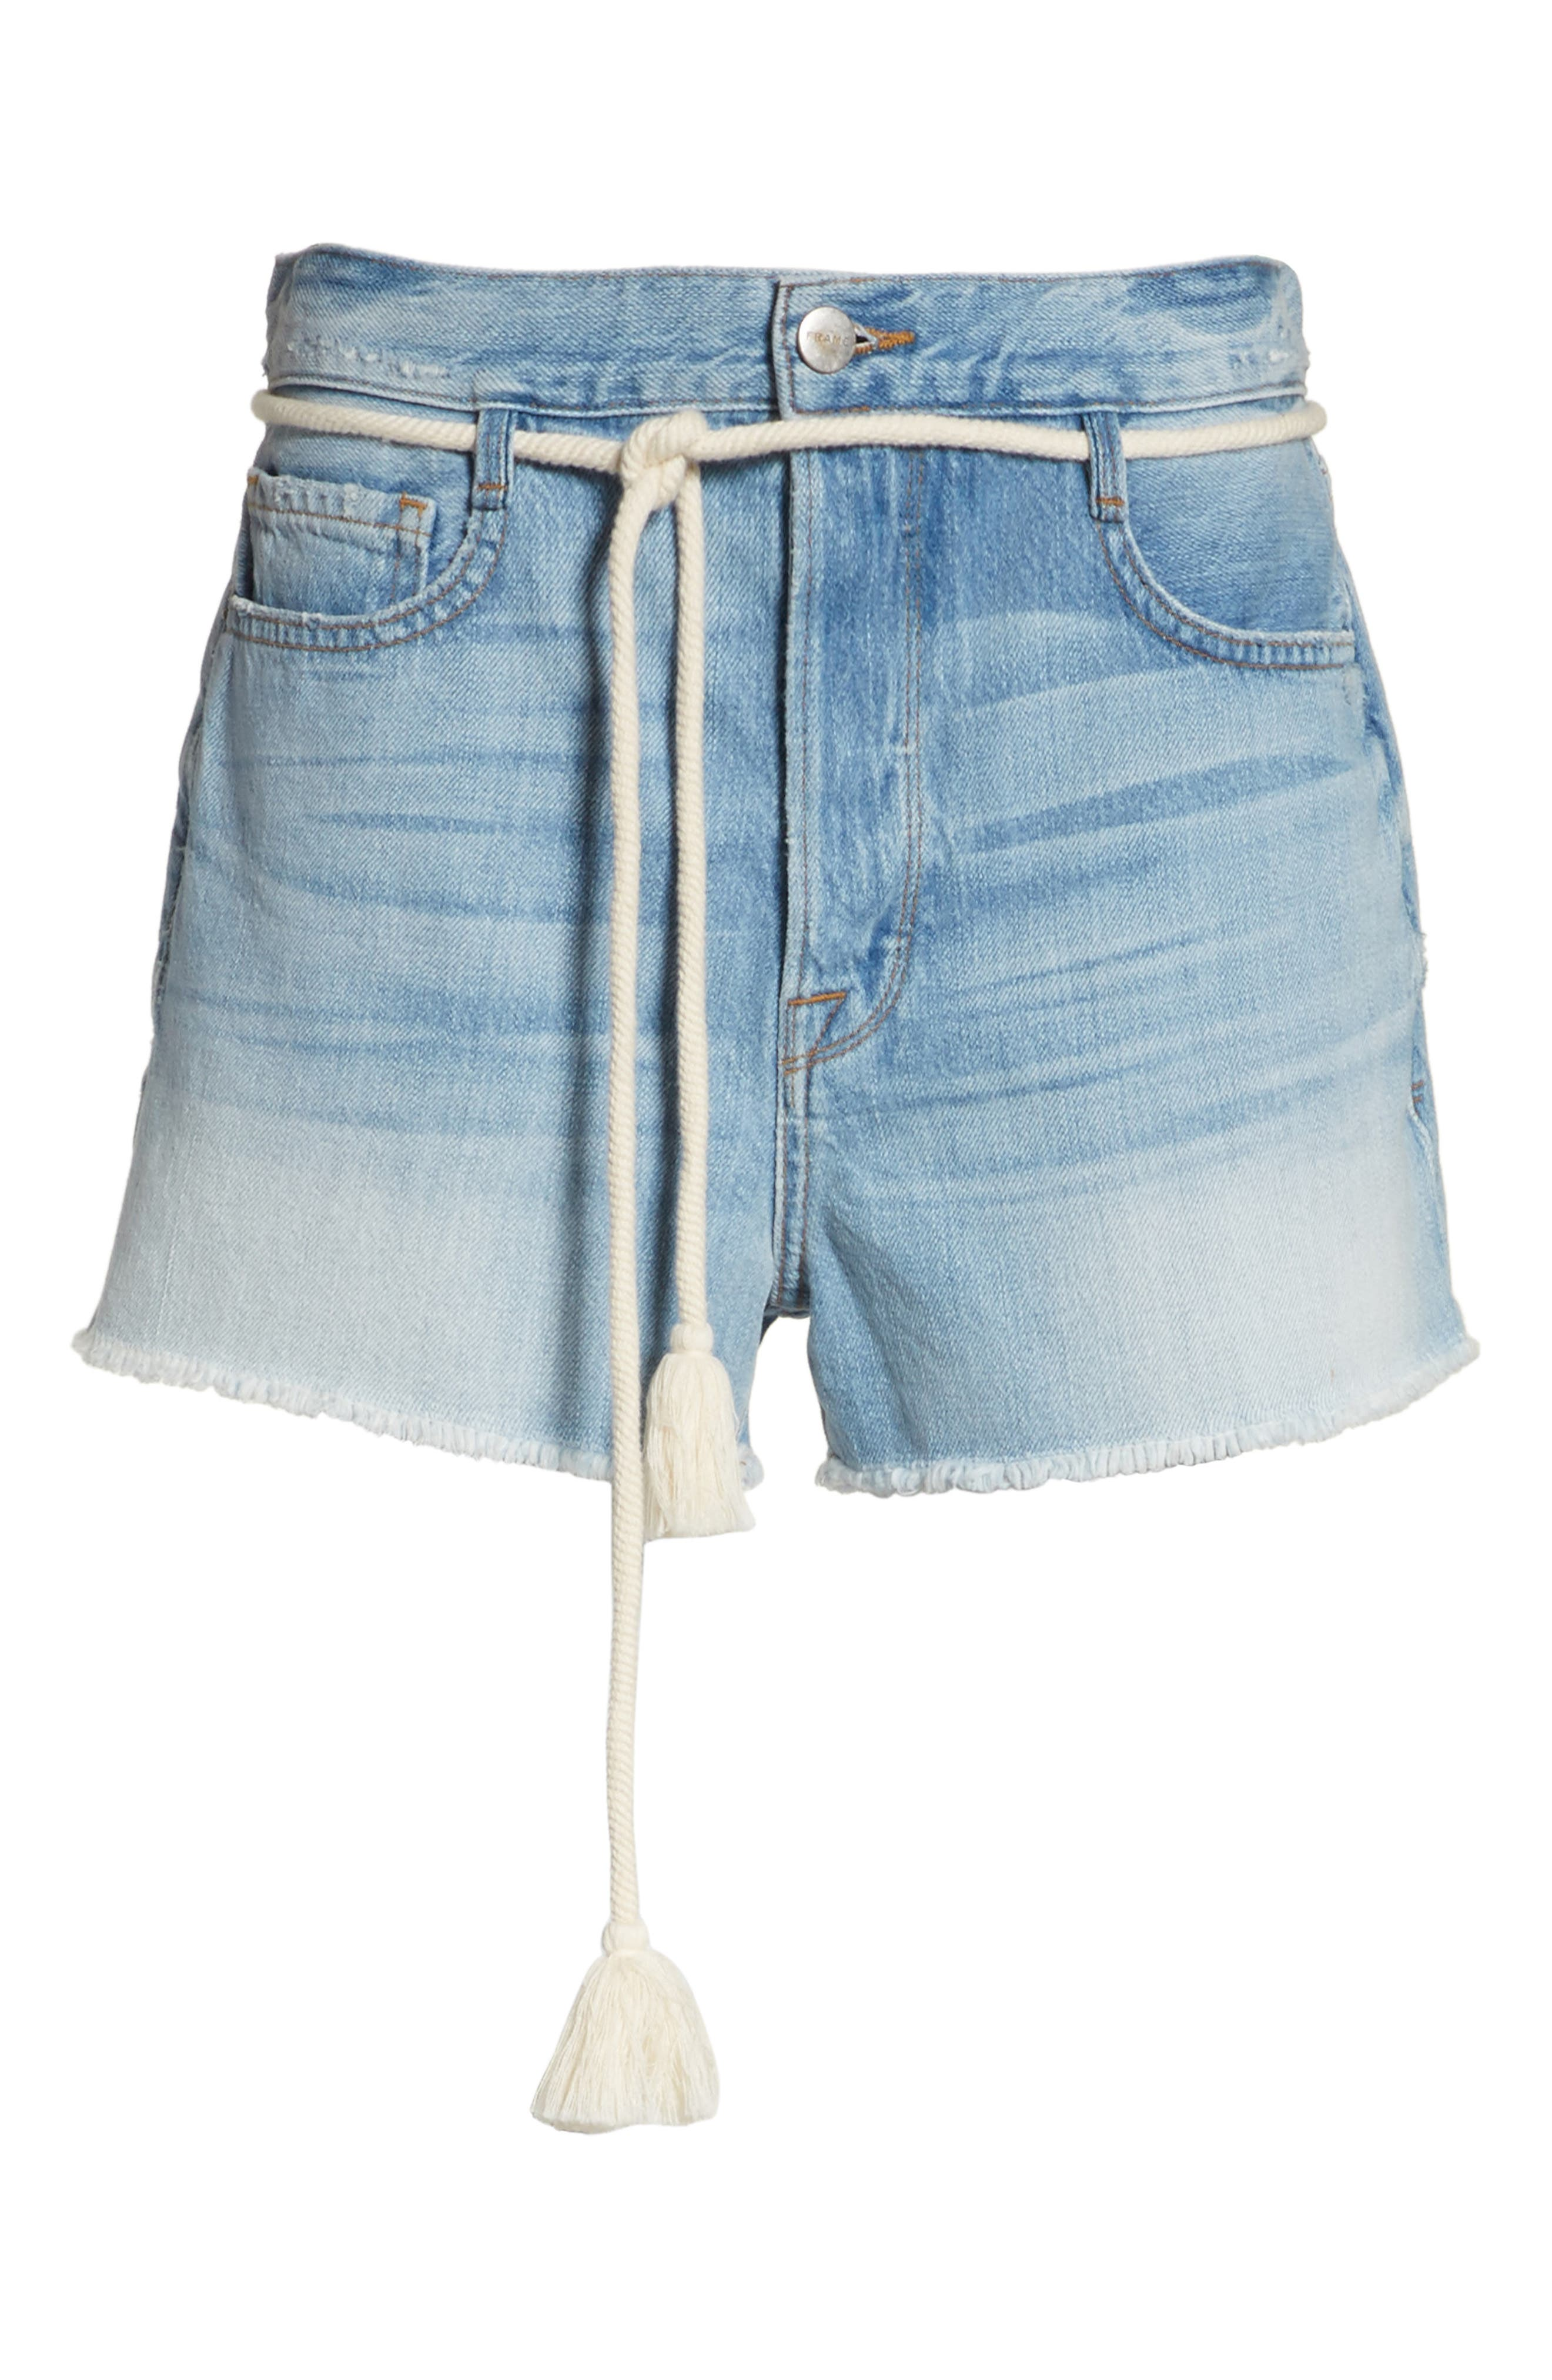 Cutoff Denim Shorts,                             Alternate thumbnail 6, color,                             402